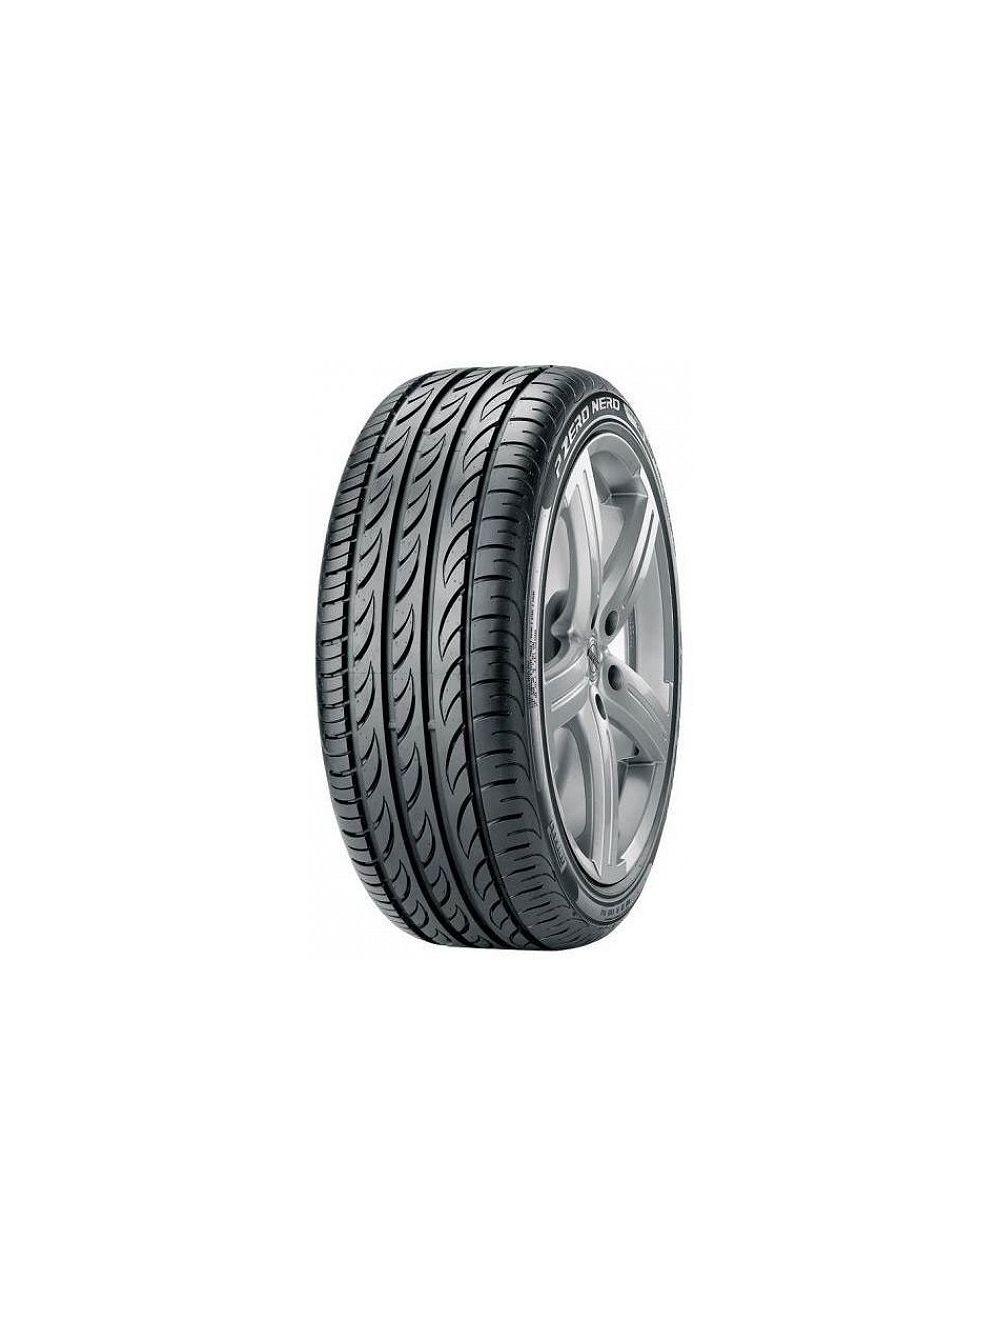 Pirelli 245/35R19 Y PZero Nero GT XL Nyári gumi